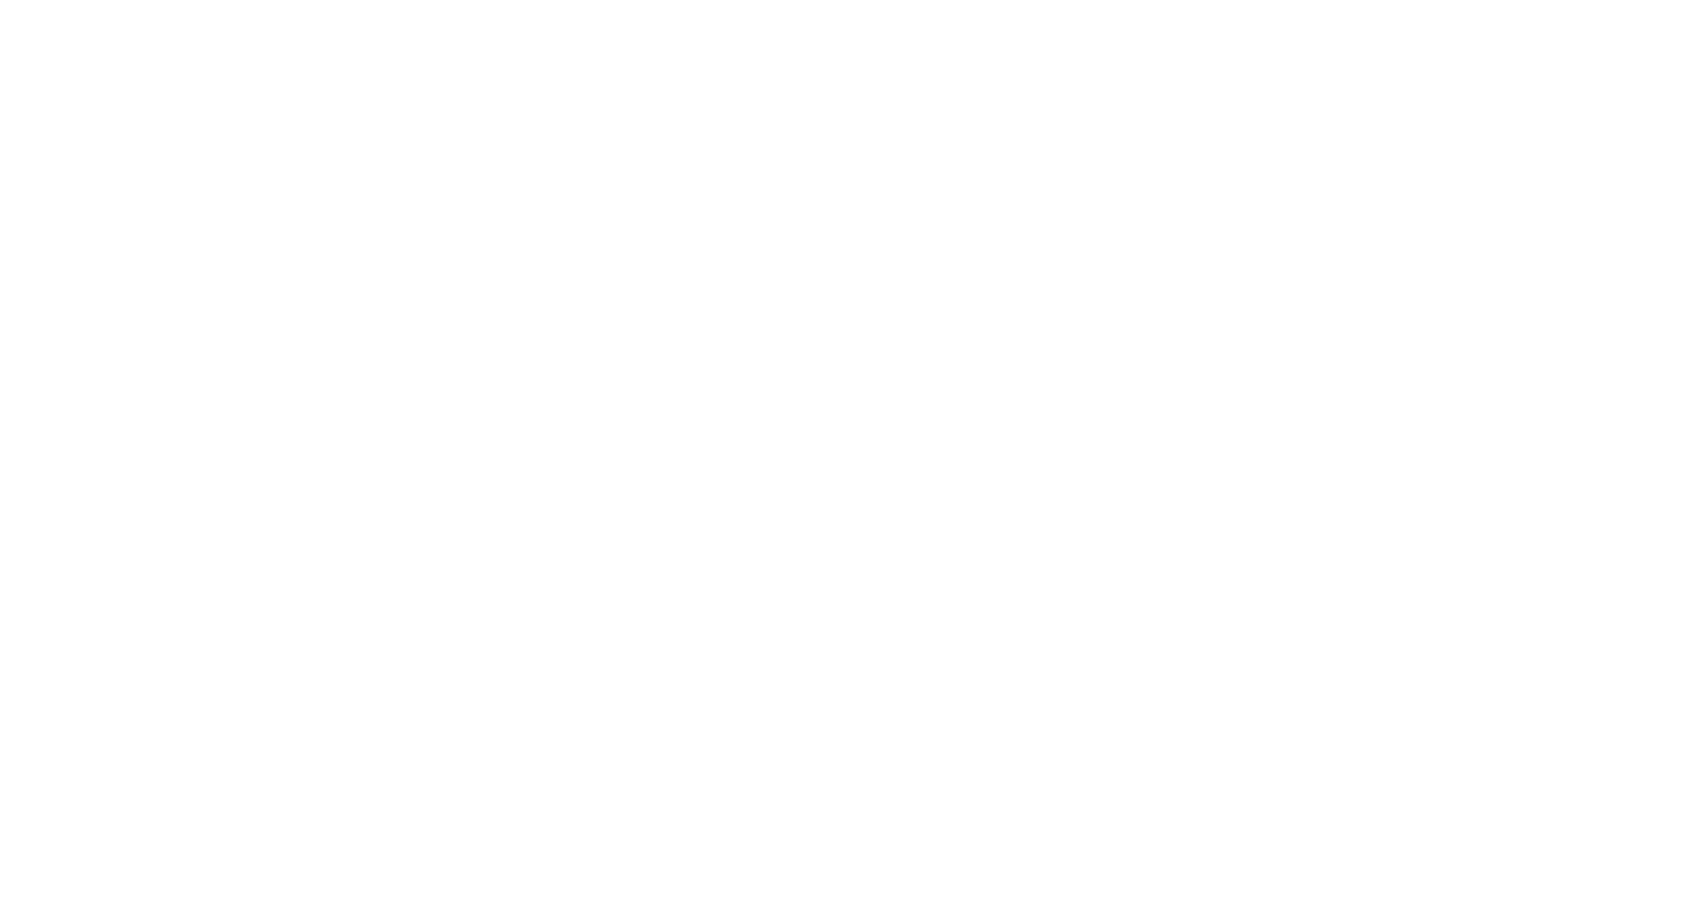 Carter@3x